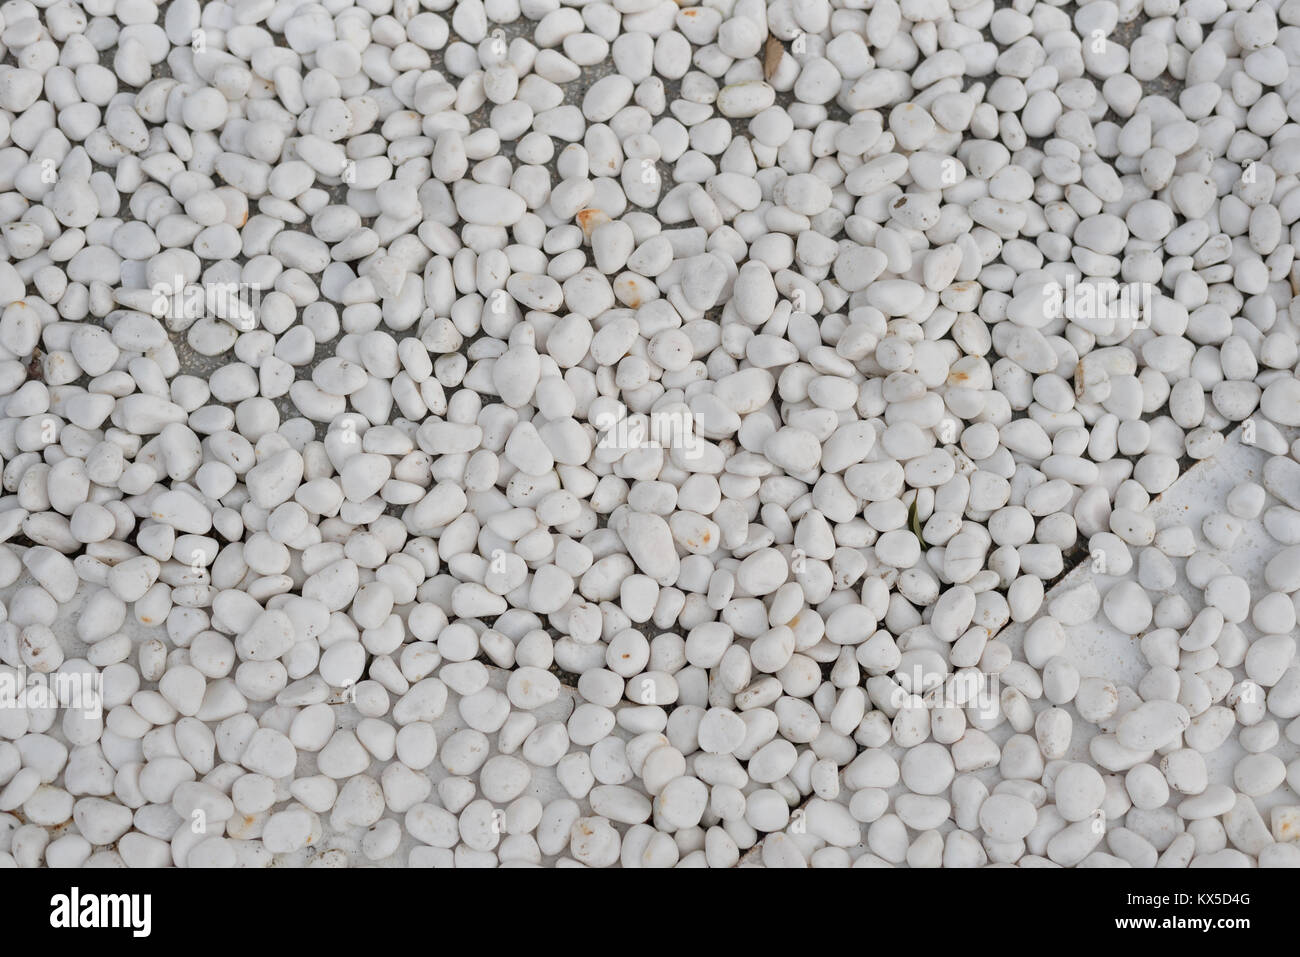 White River Stone Pebbles On Ground For Decorative Garden